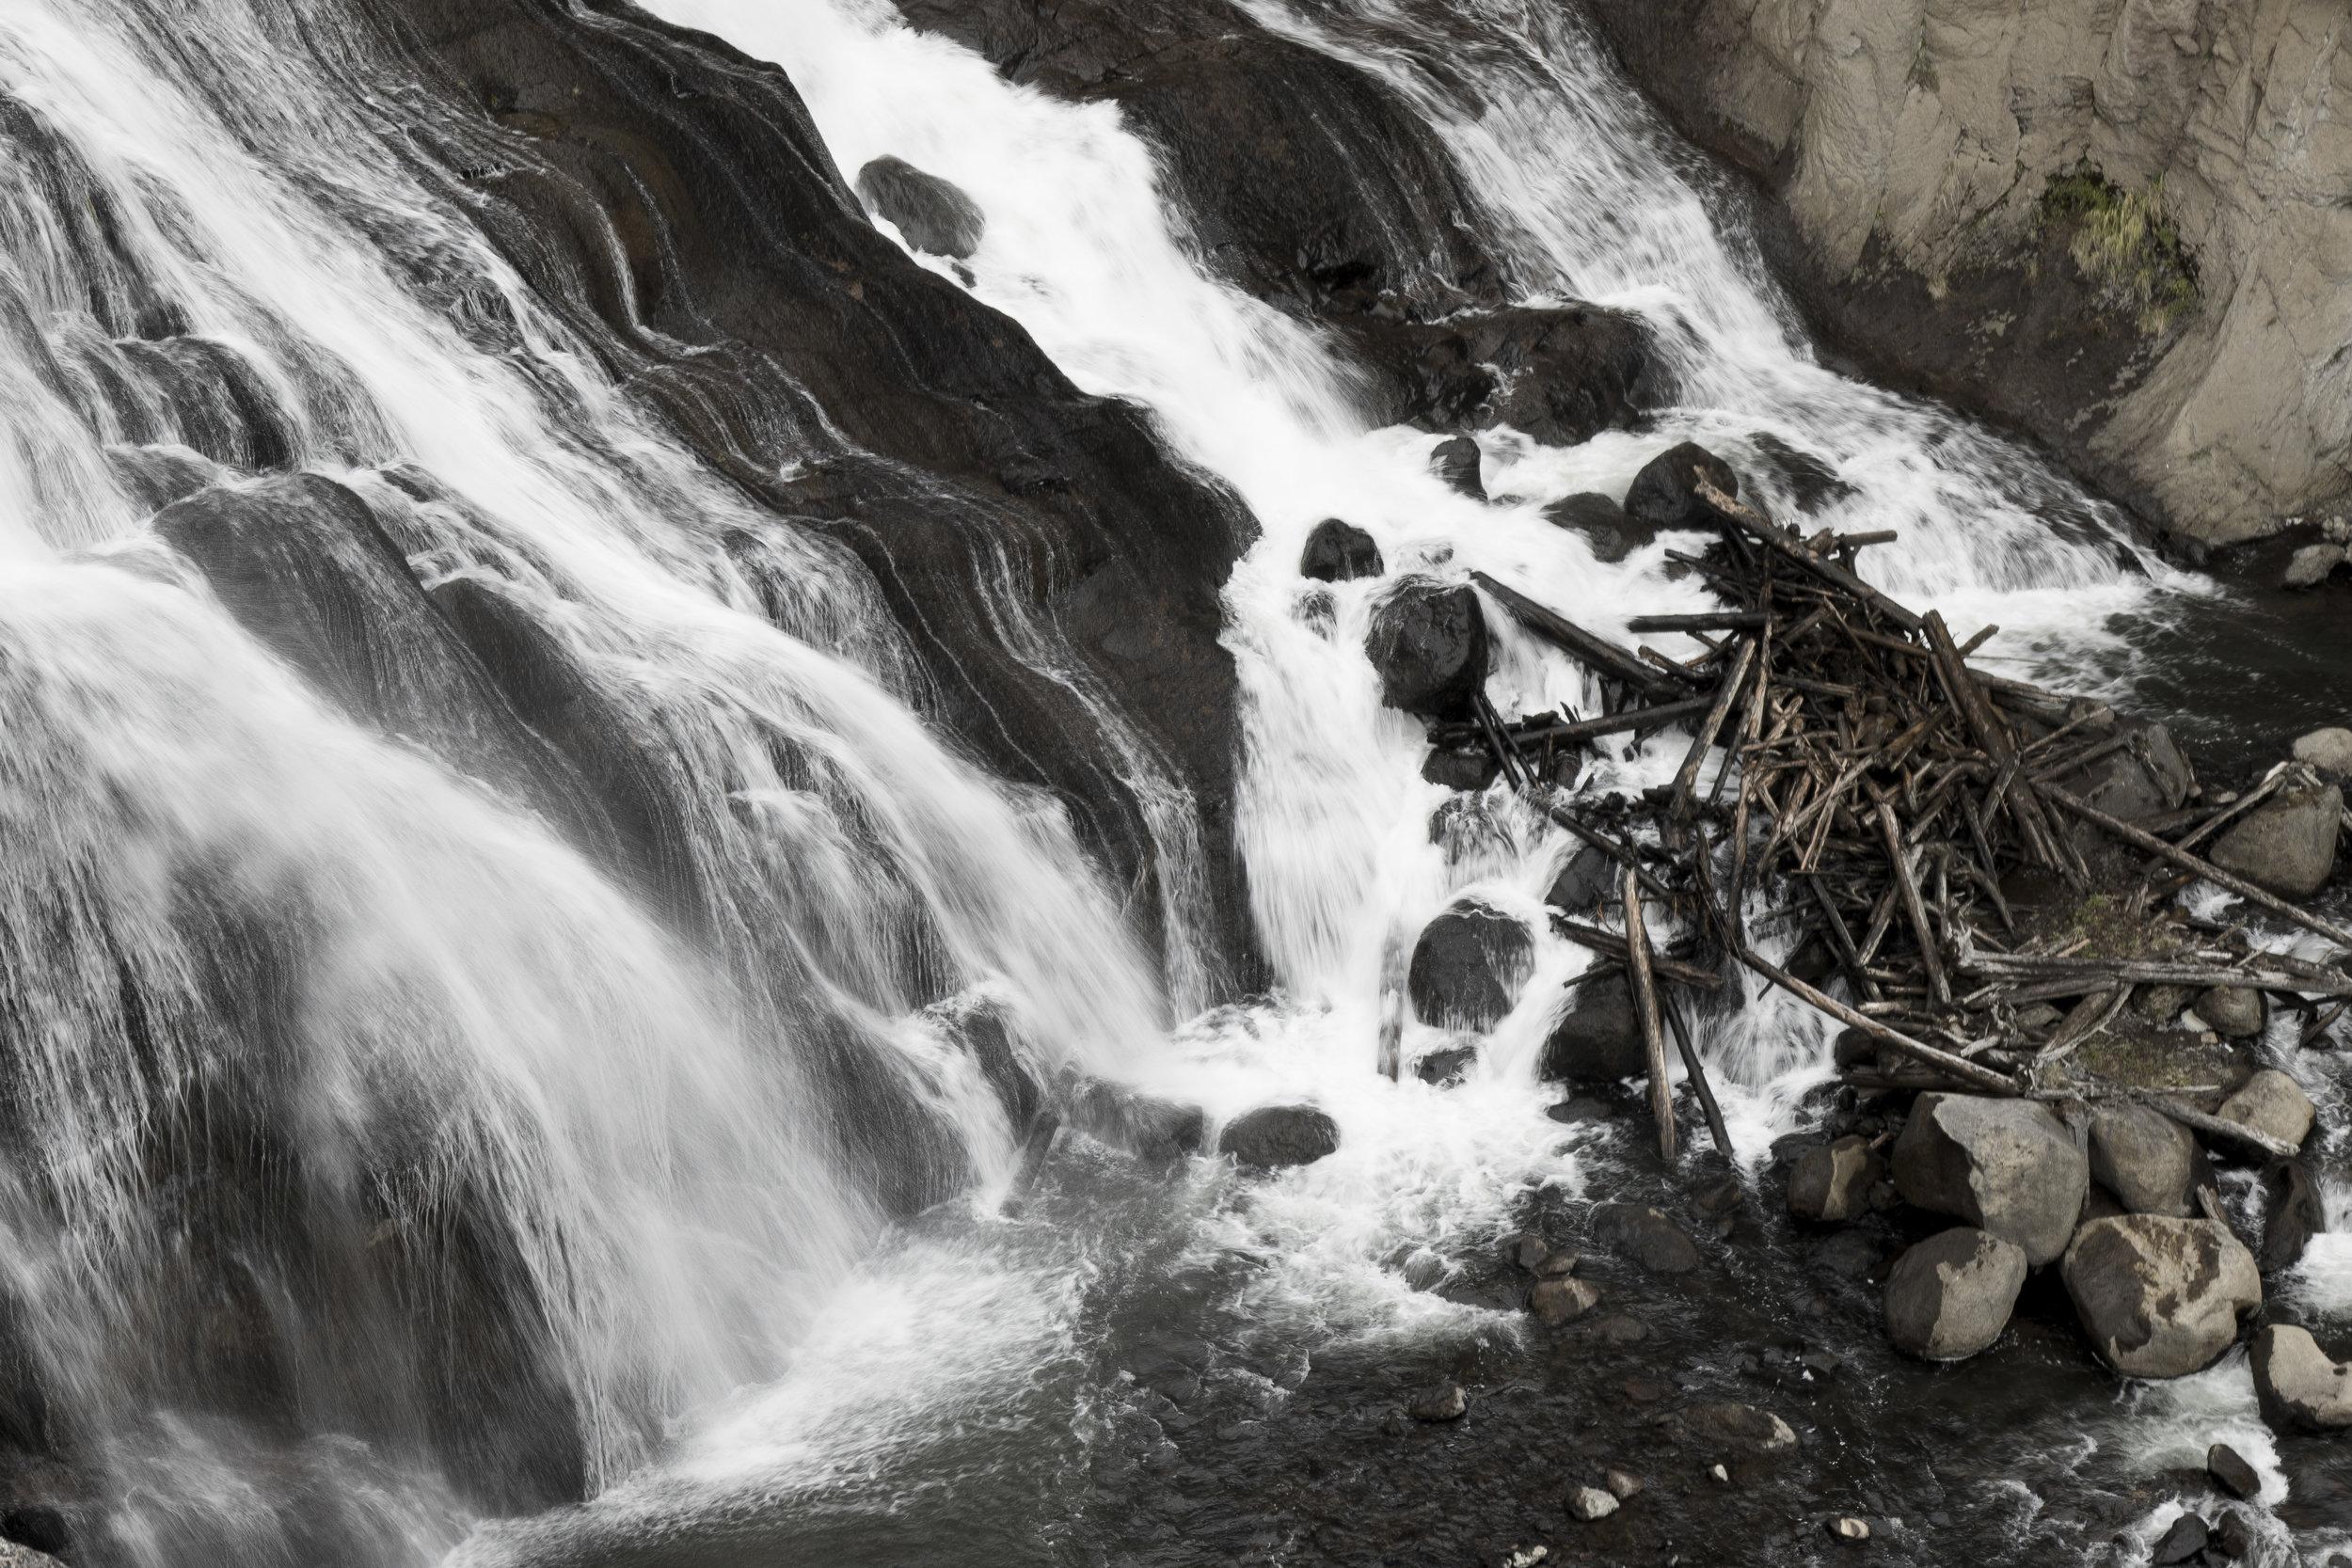 Waterfall onto rocks